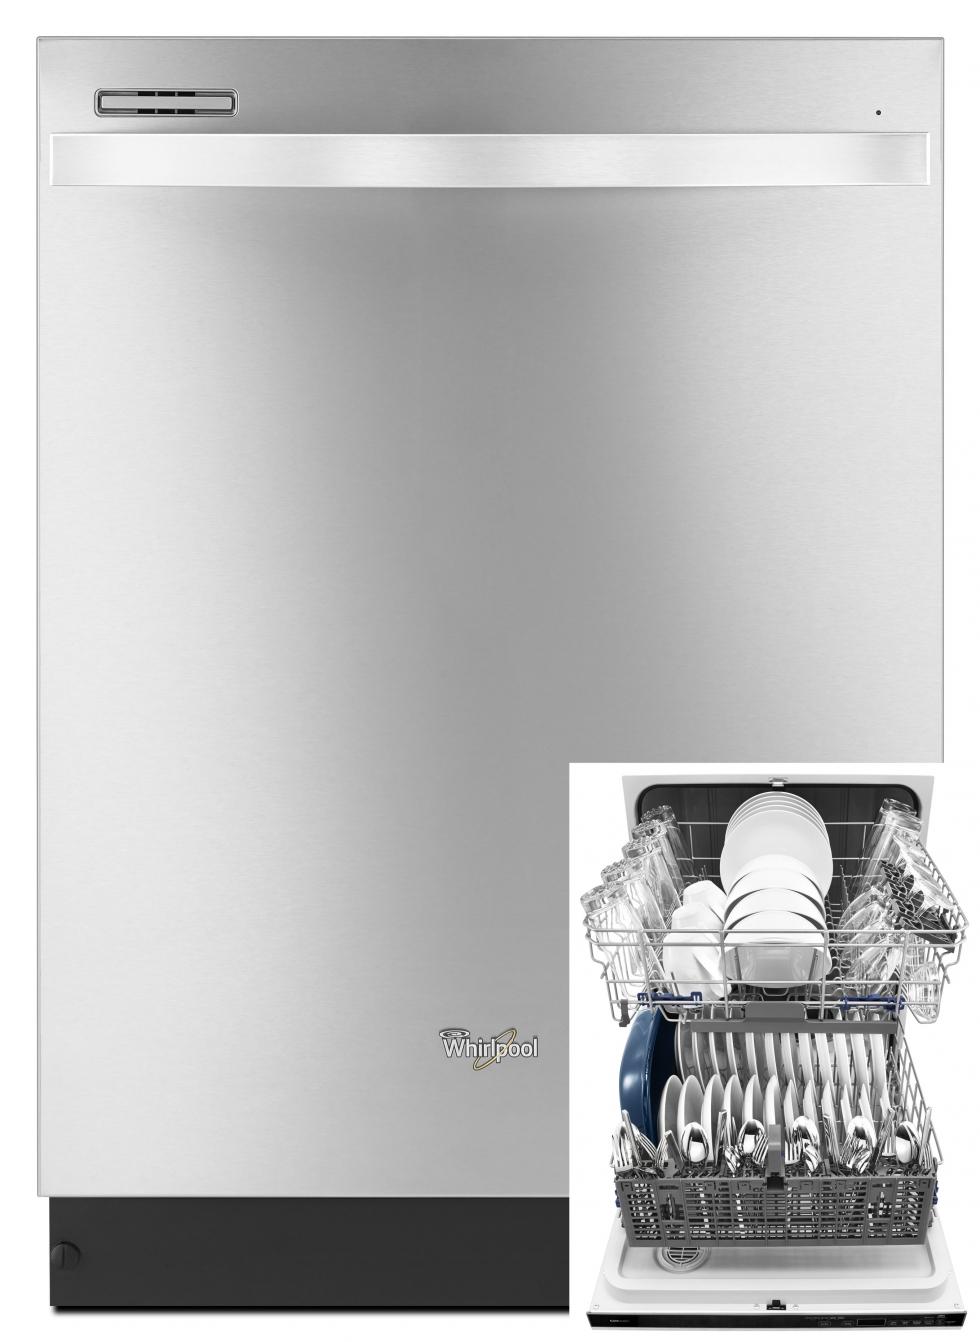 Whirlpool Gold Dishwasher Stainless Steel Start Saving Today